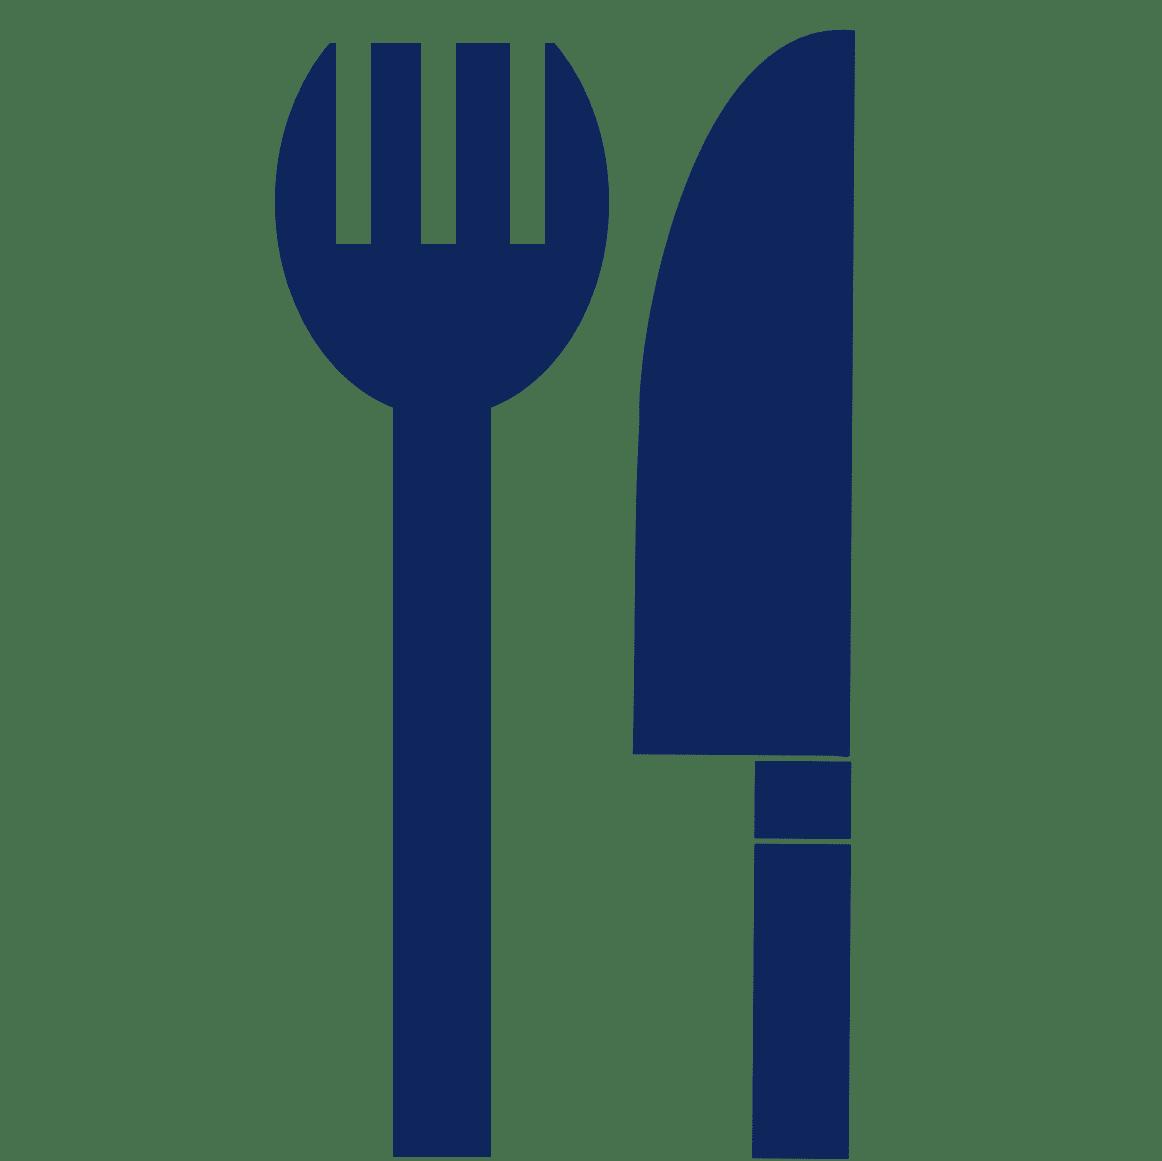 Gastronomie, Lebensmittel